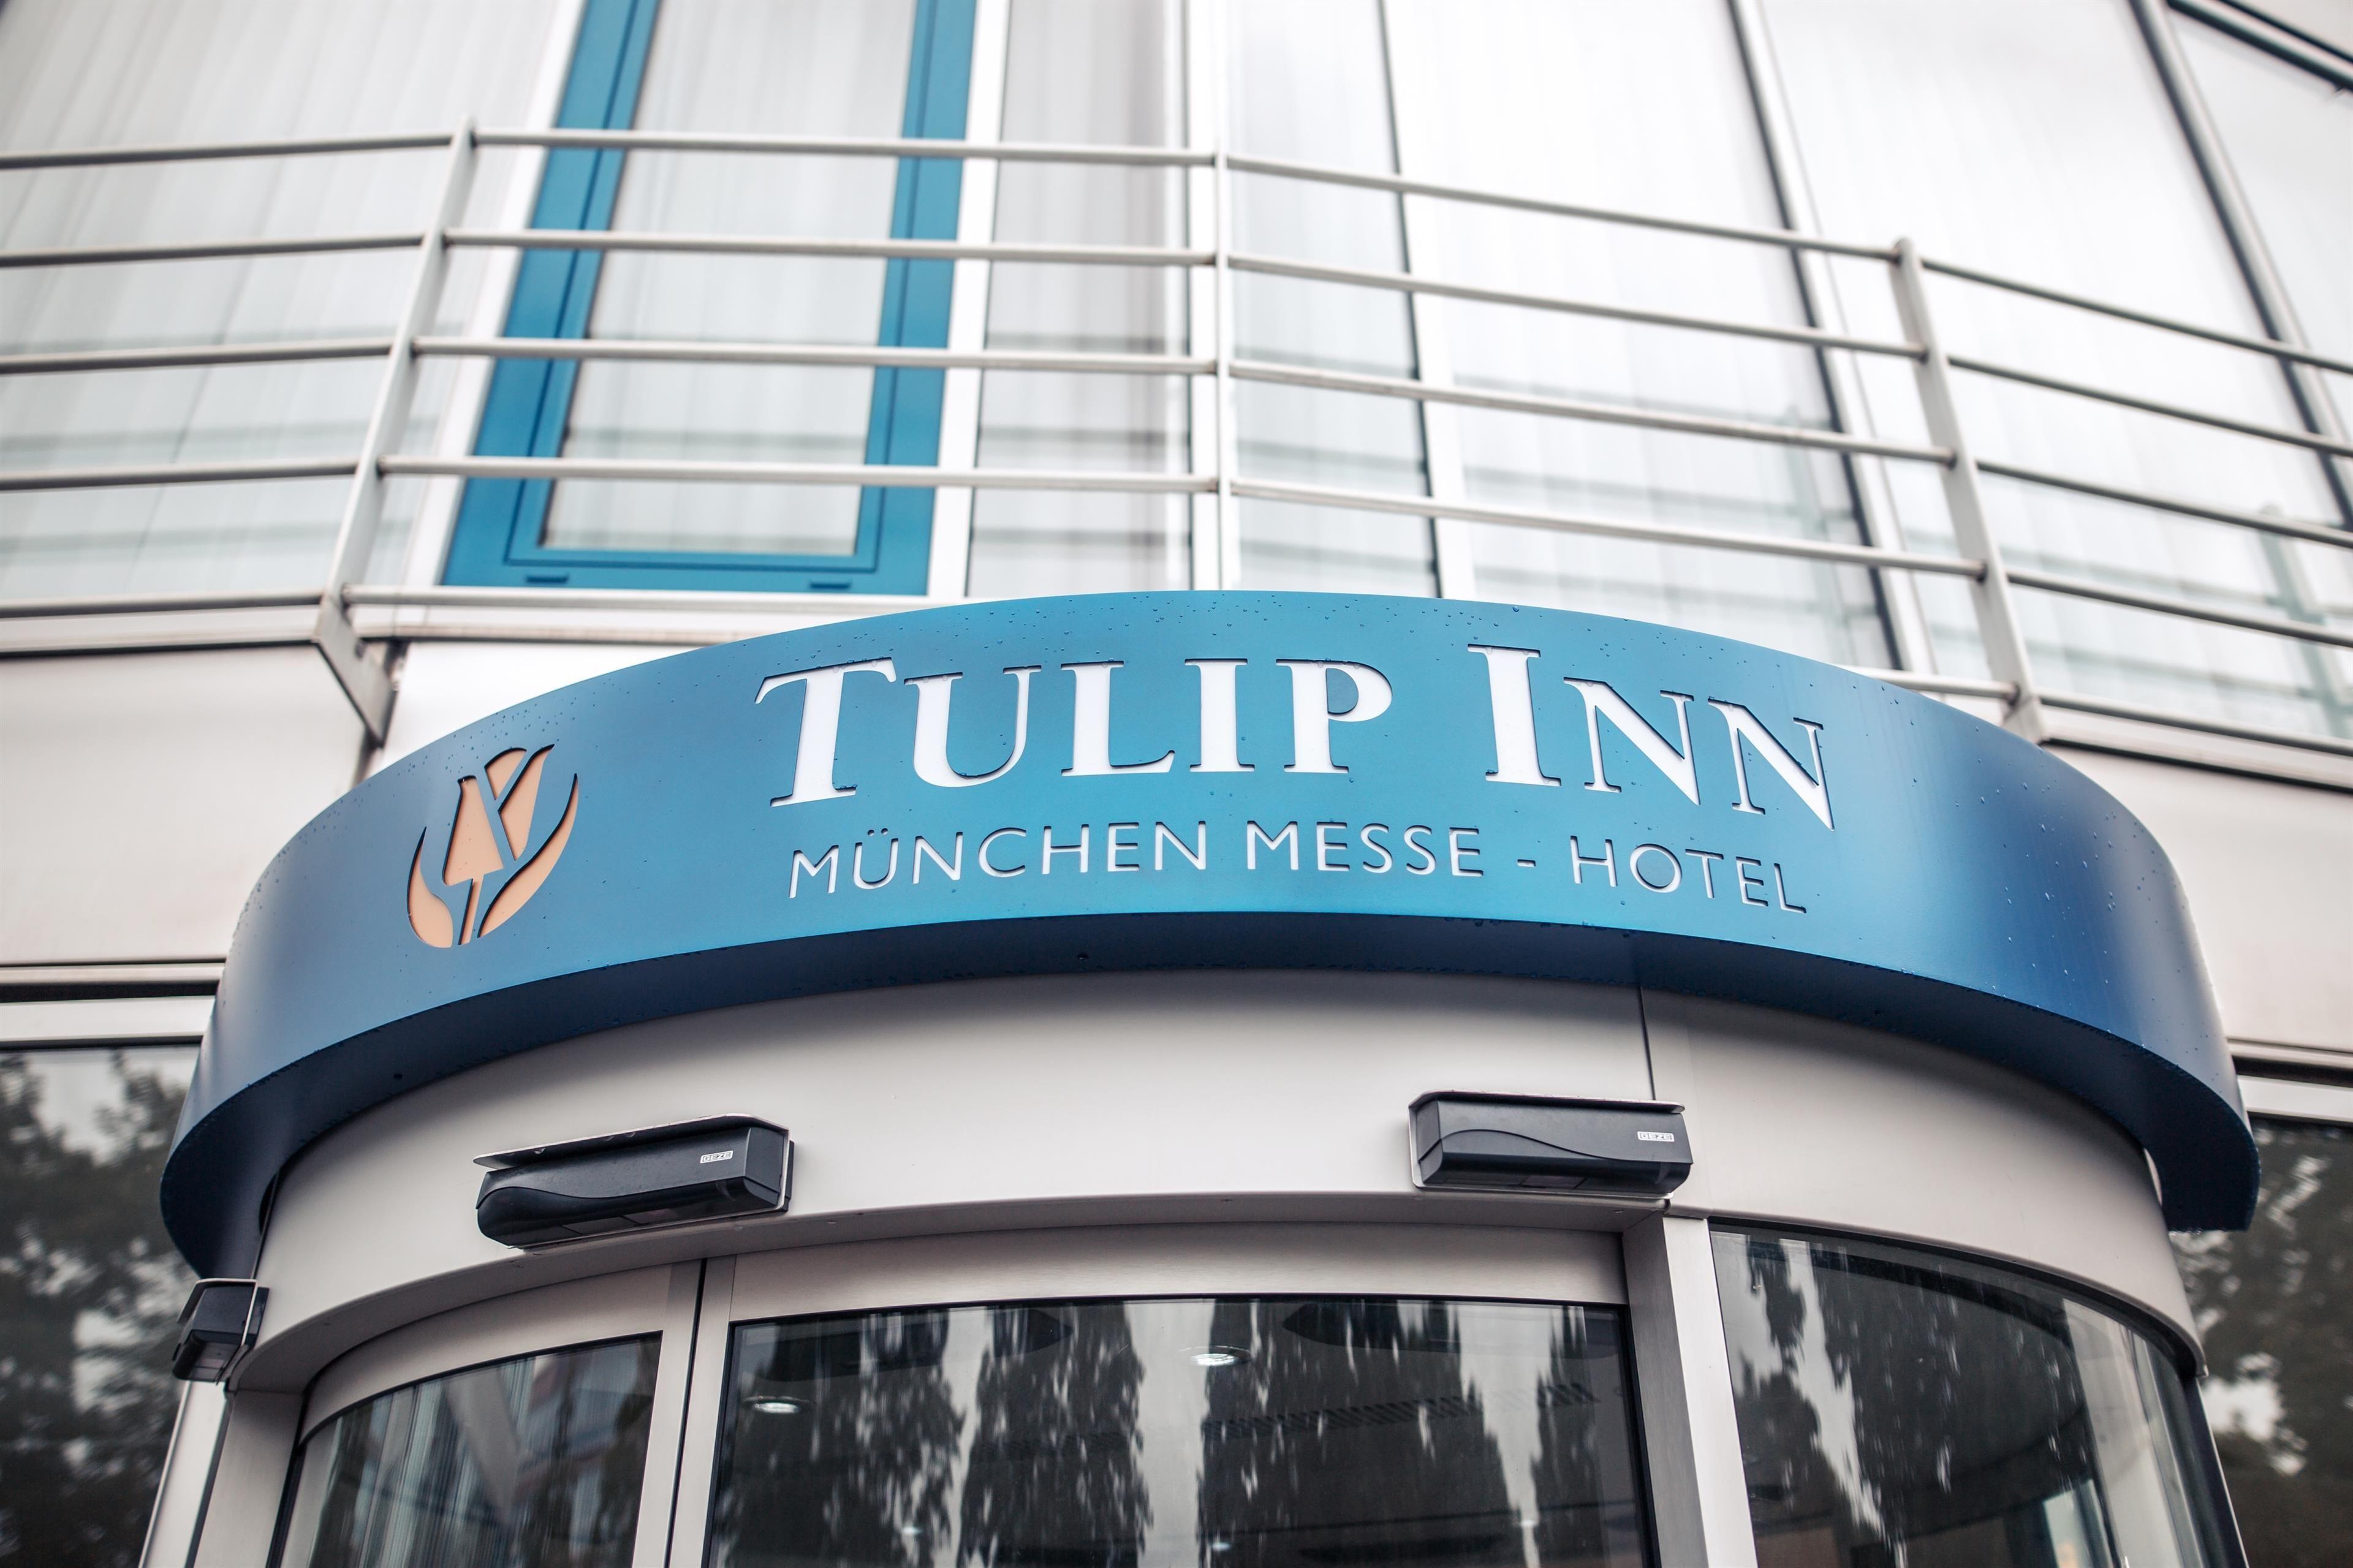 Tulip Inn Muenchen Messe